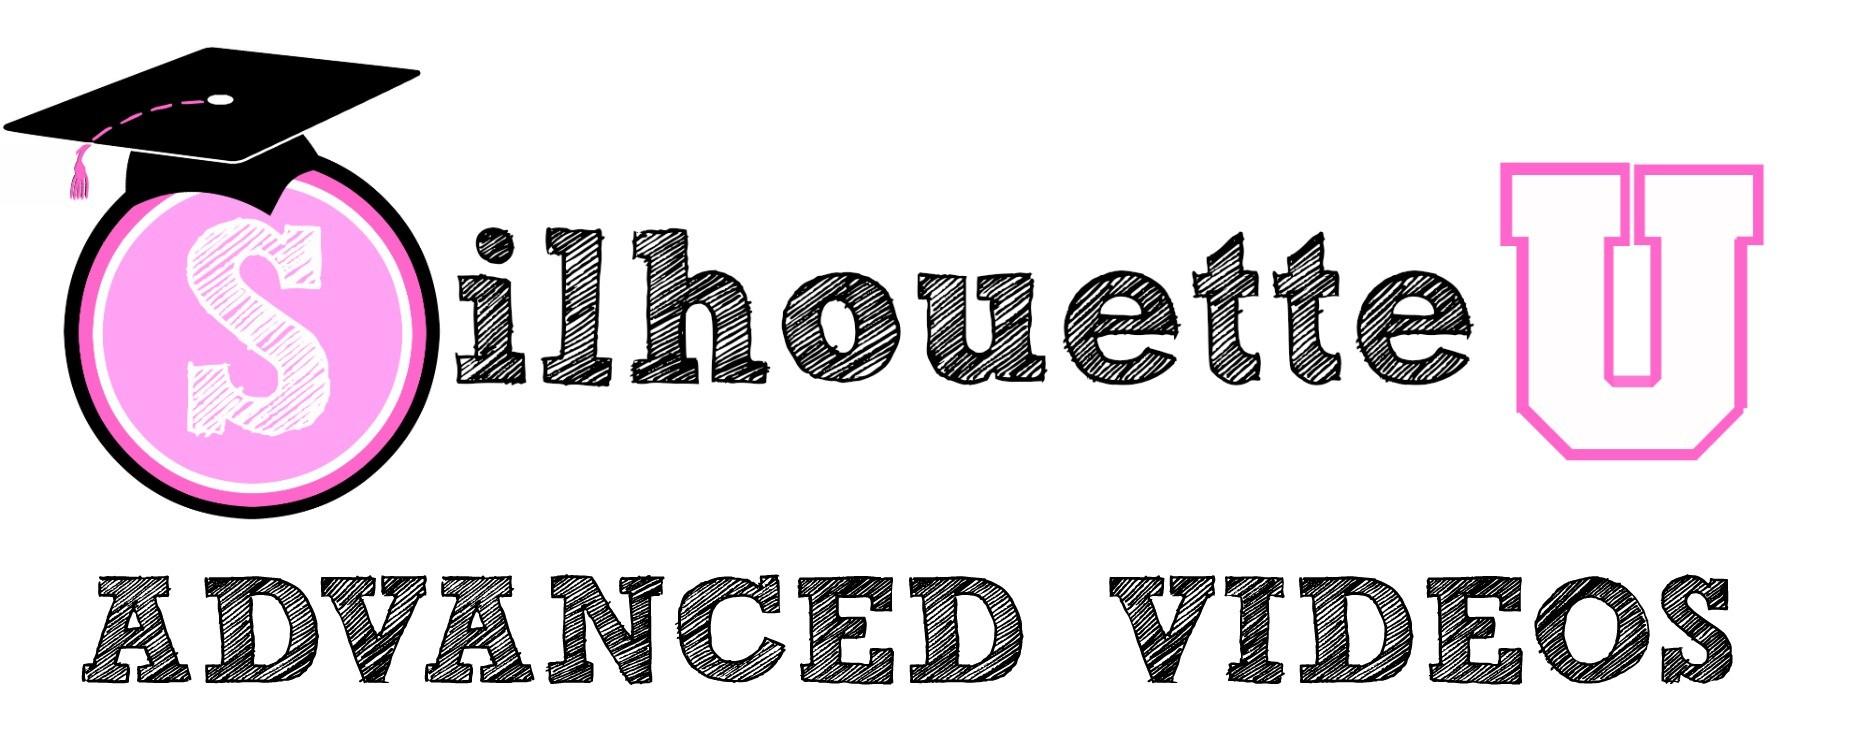 SU Advanced Videos Banner Image.jpg